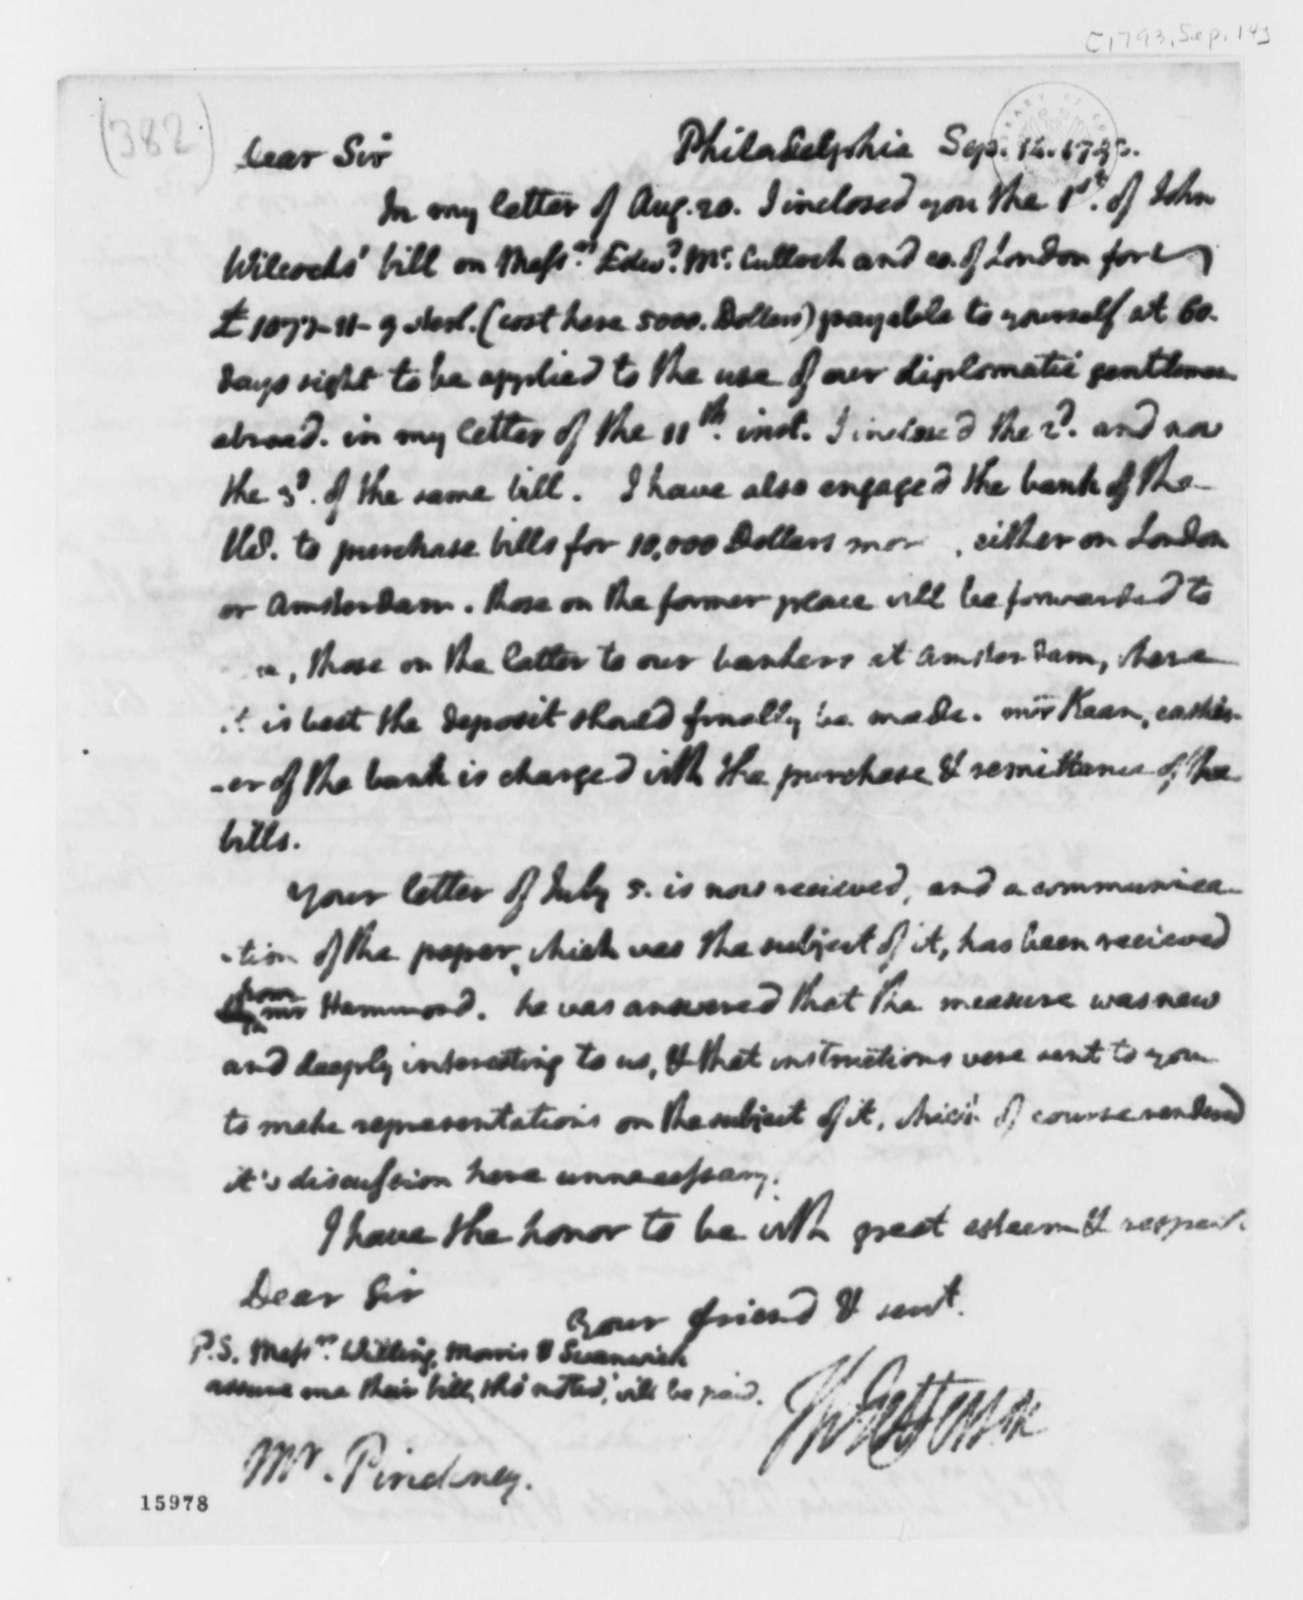 Thomas Jefferson to Thomas Pinckney, September 14, 1793